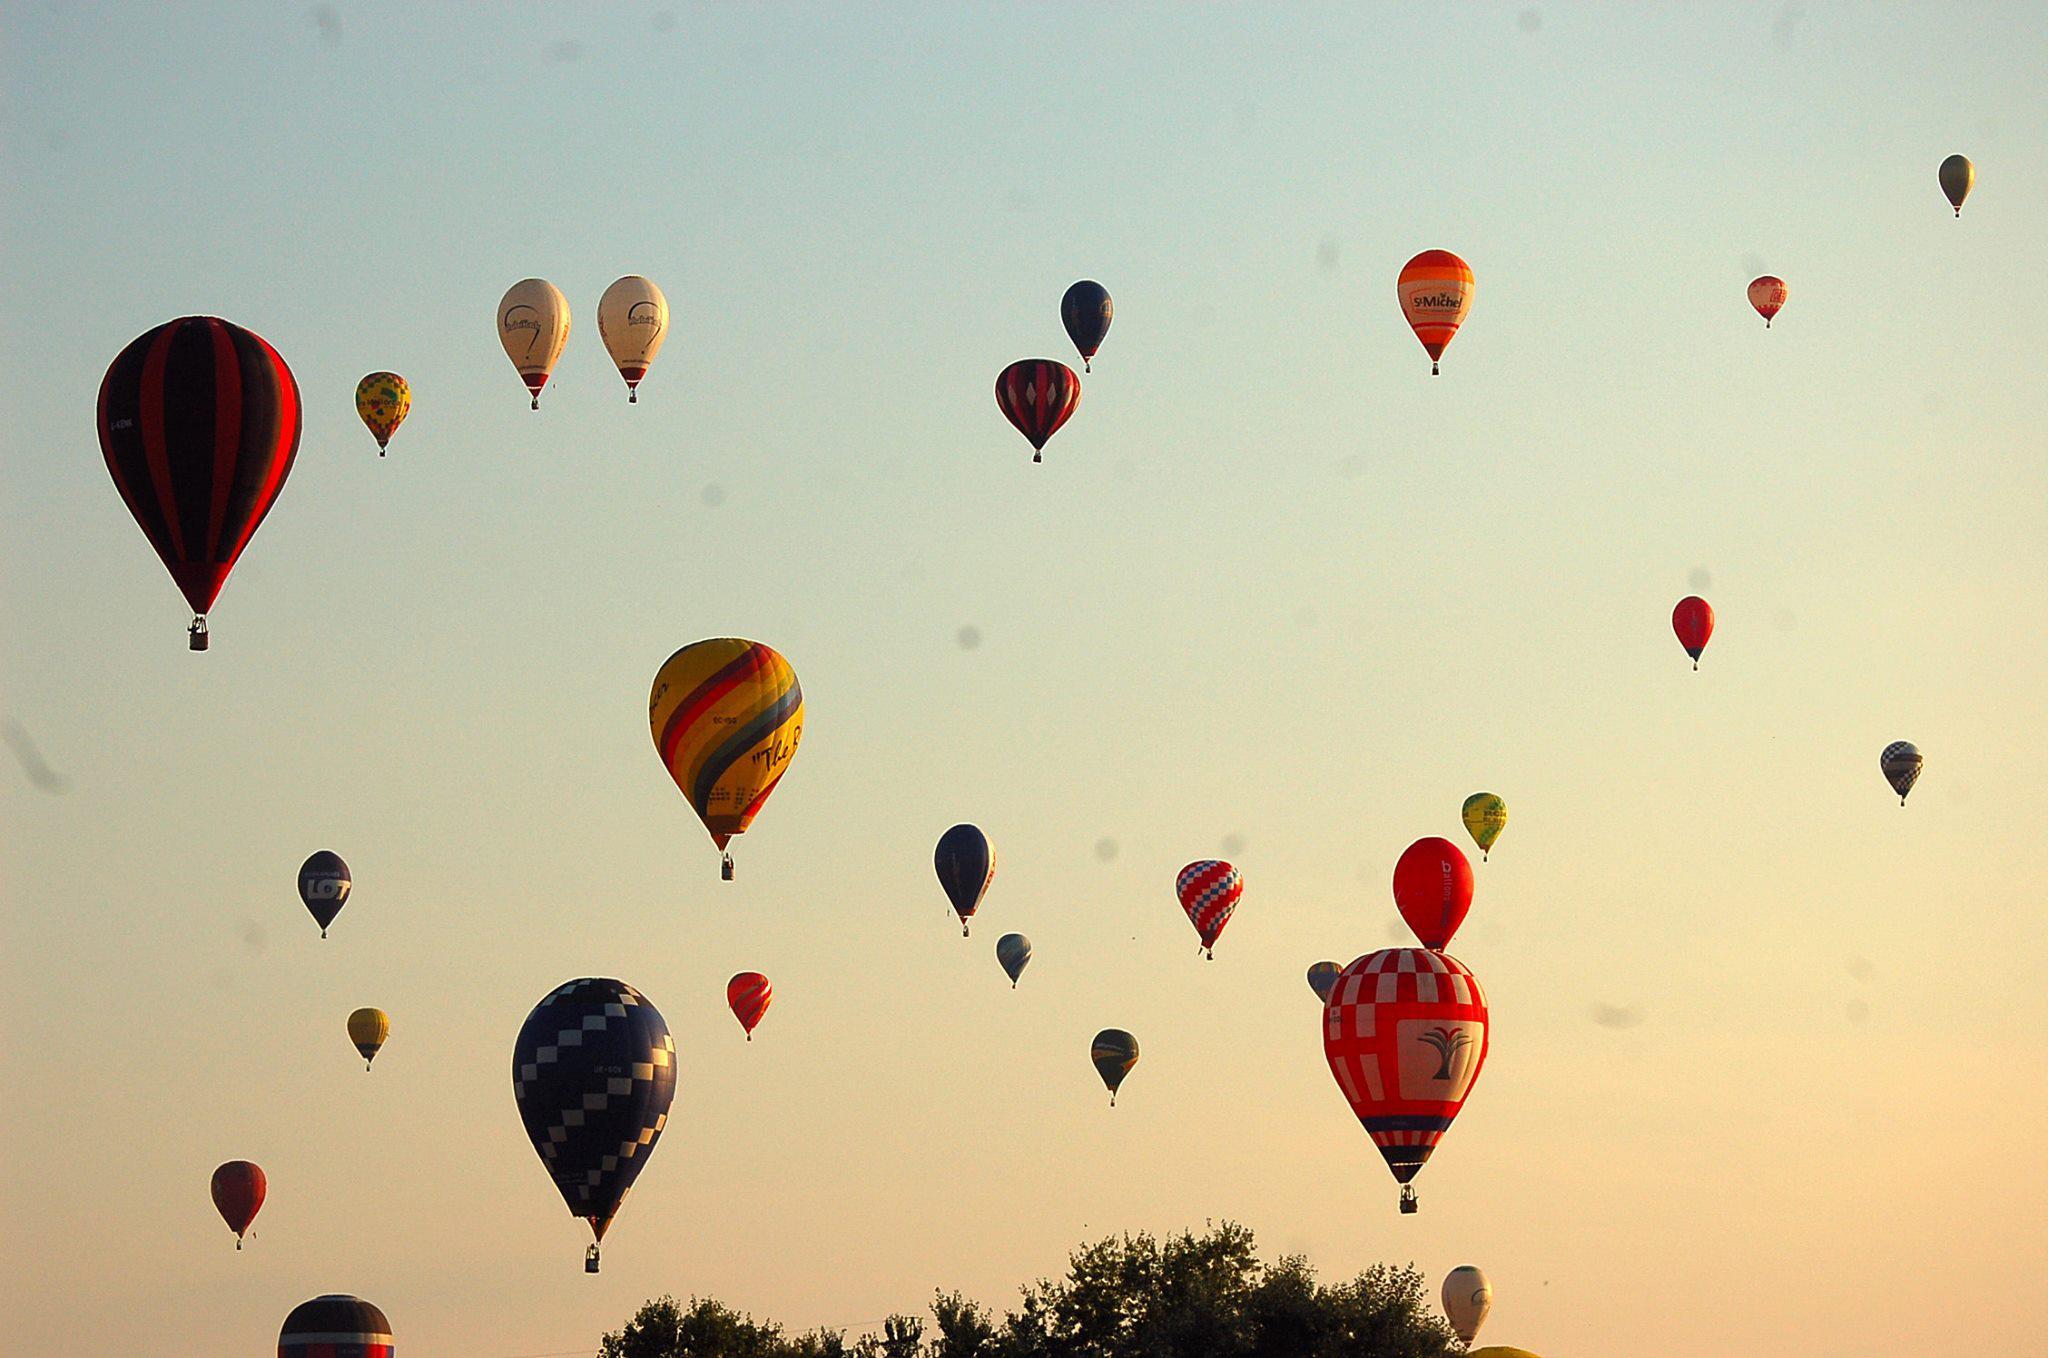 XXI Campeonato de Europa de globos aerostáticos